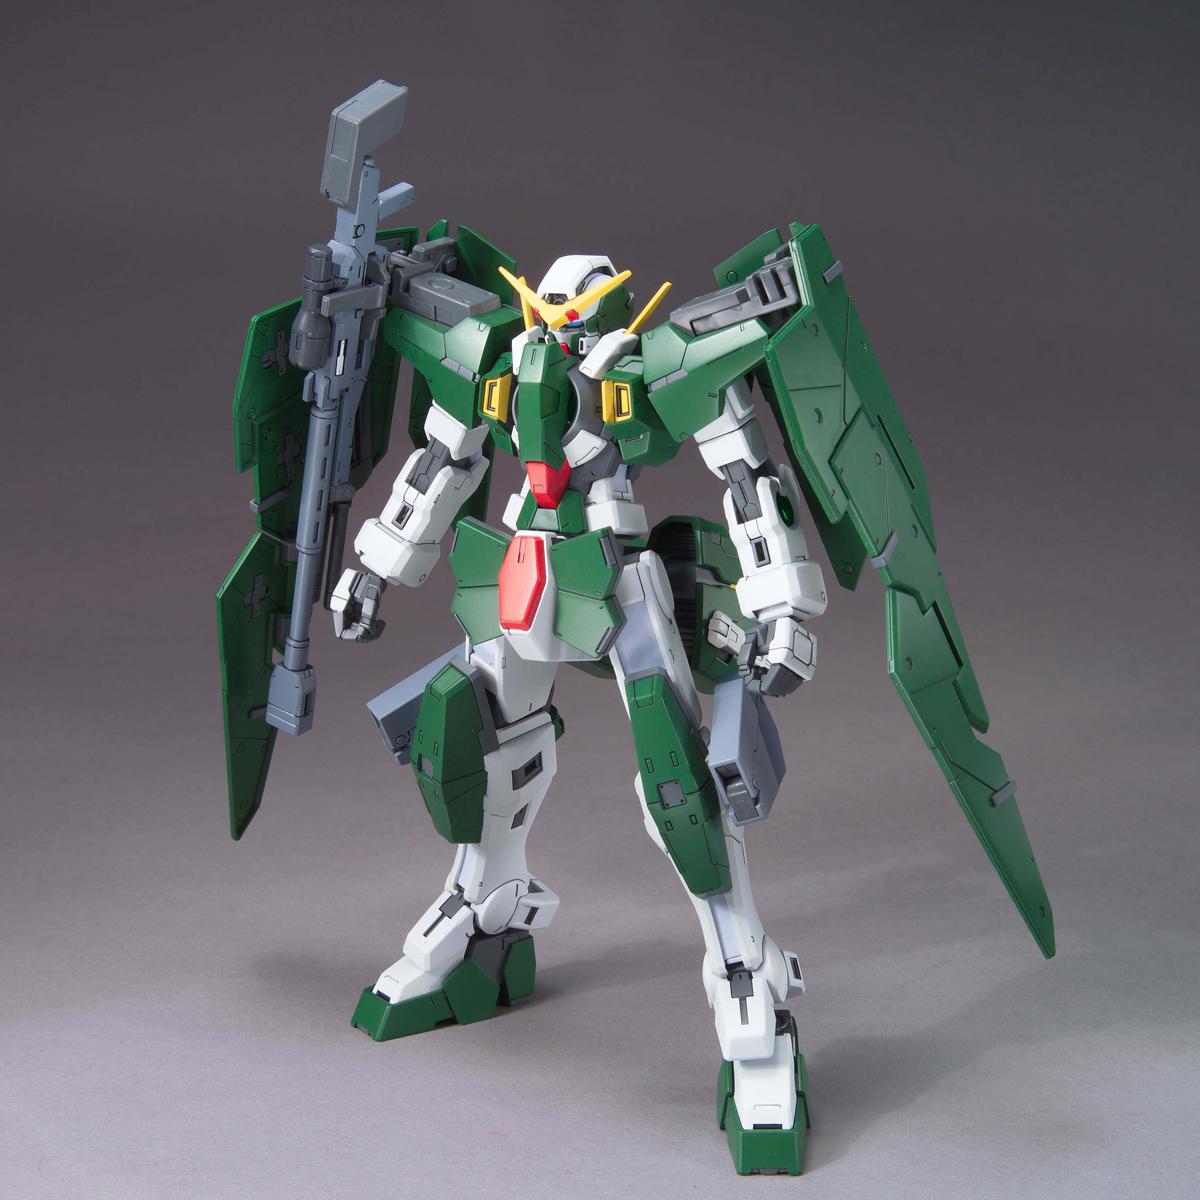 889131/100 GN-002 ガンダムデュナメス [Gundam Dynames]